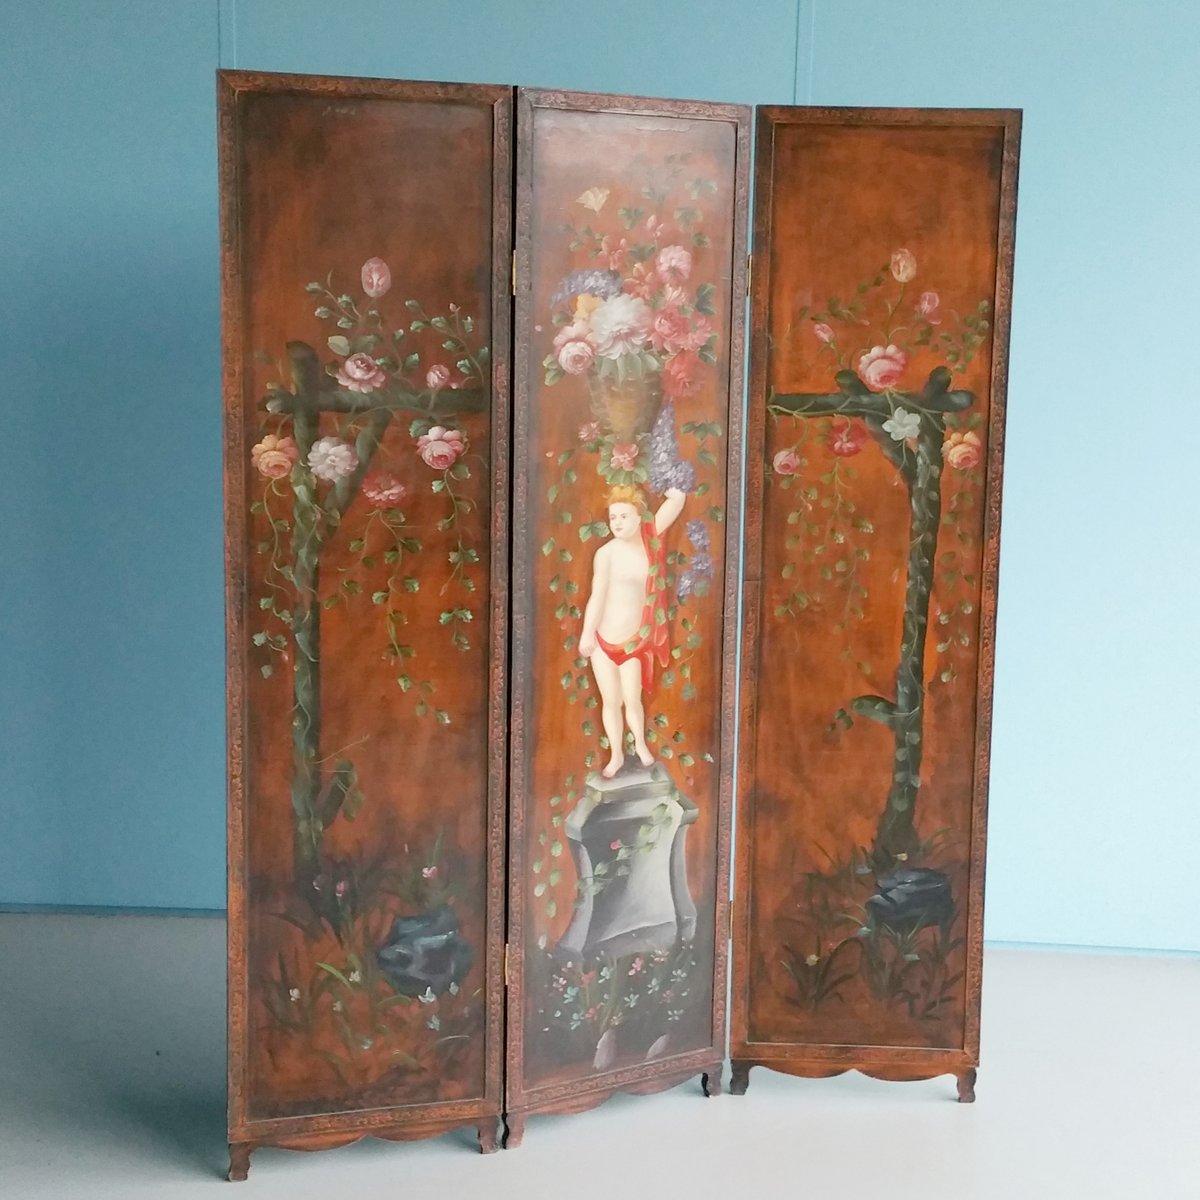 antiker handbemalter raumteiler aus holz bei pamono kaufen. Black Bedroom Furniture Sets. Home Design Ideas